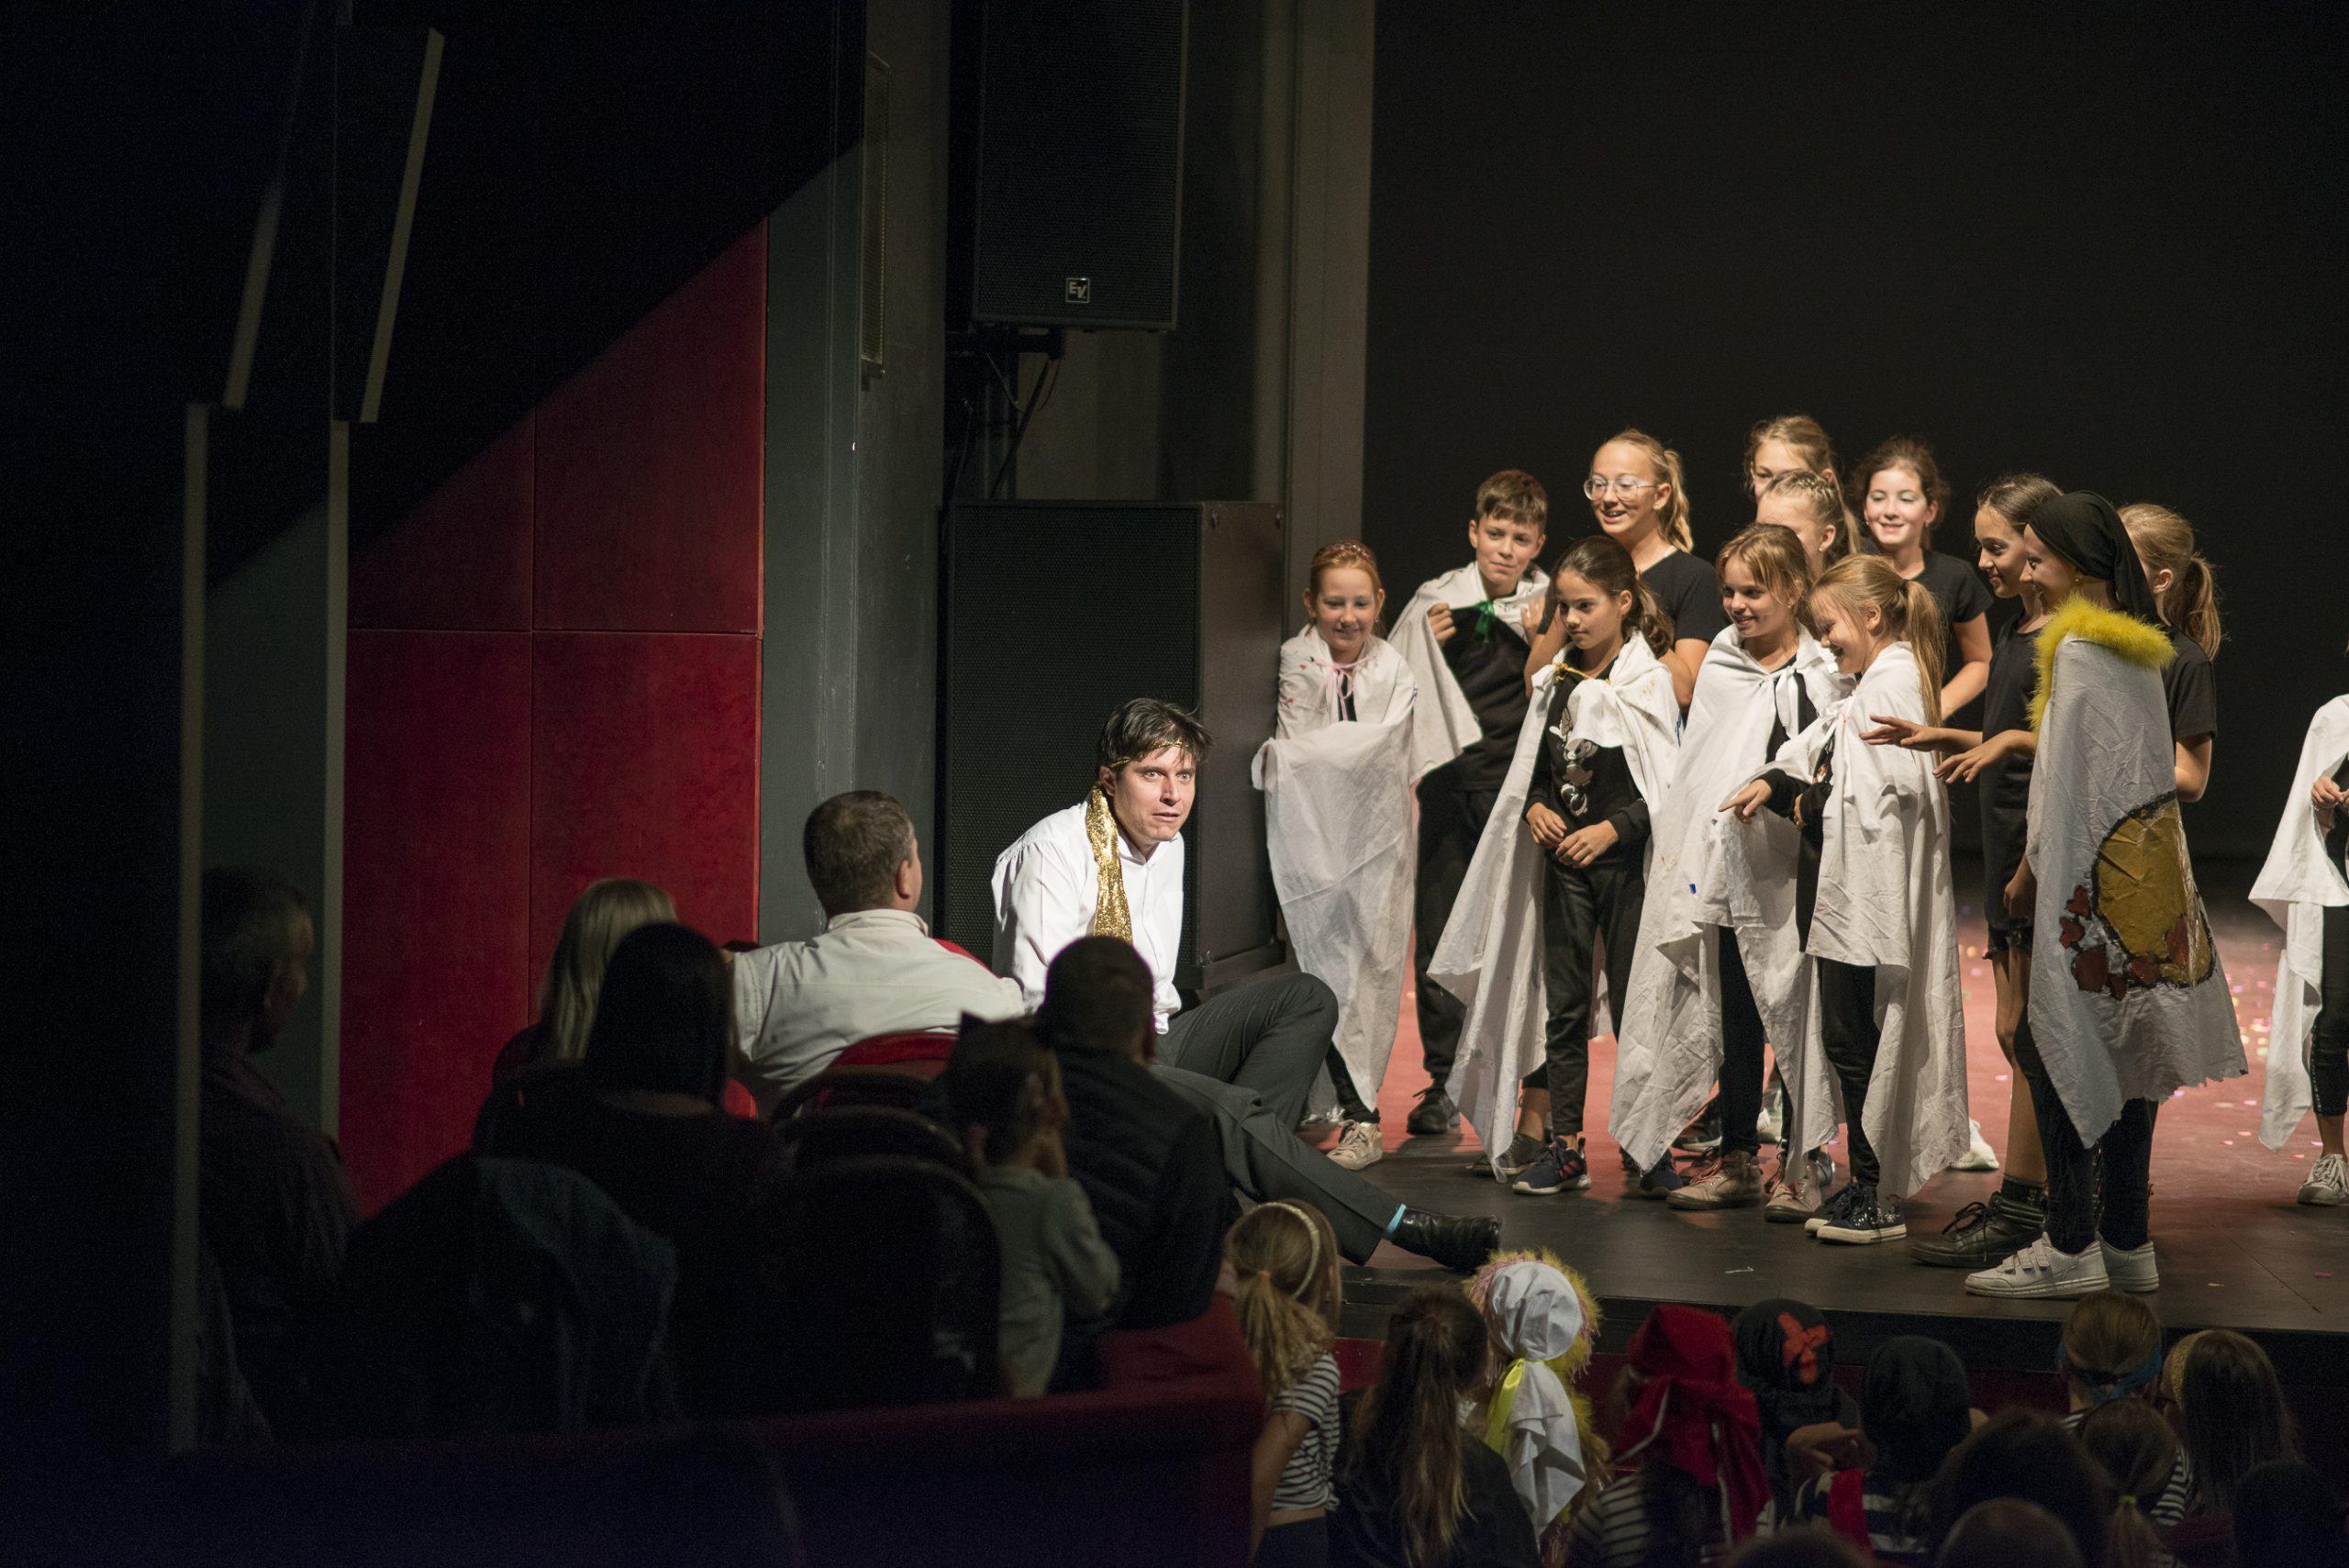 djp, divadlo, deti, predstavenie, kultúra